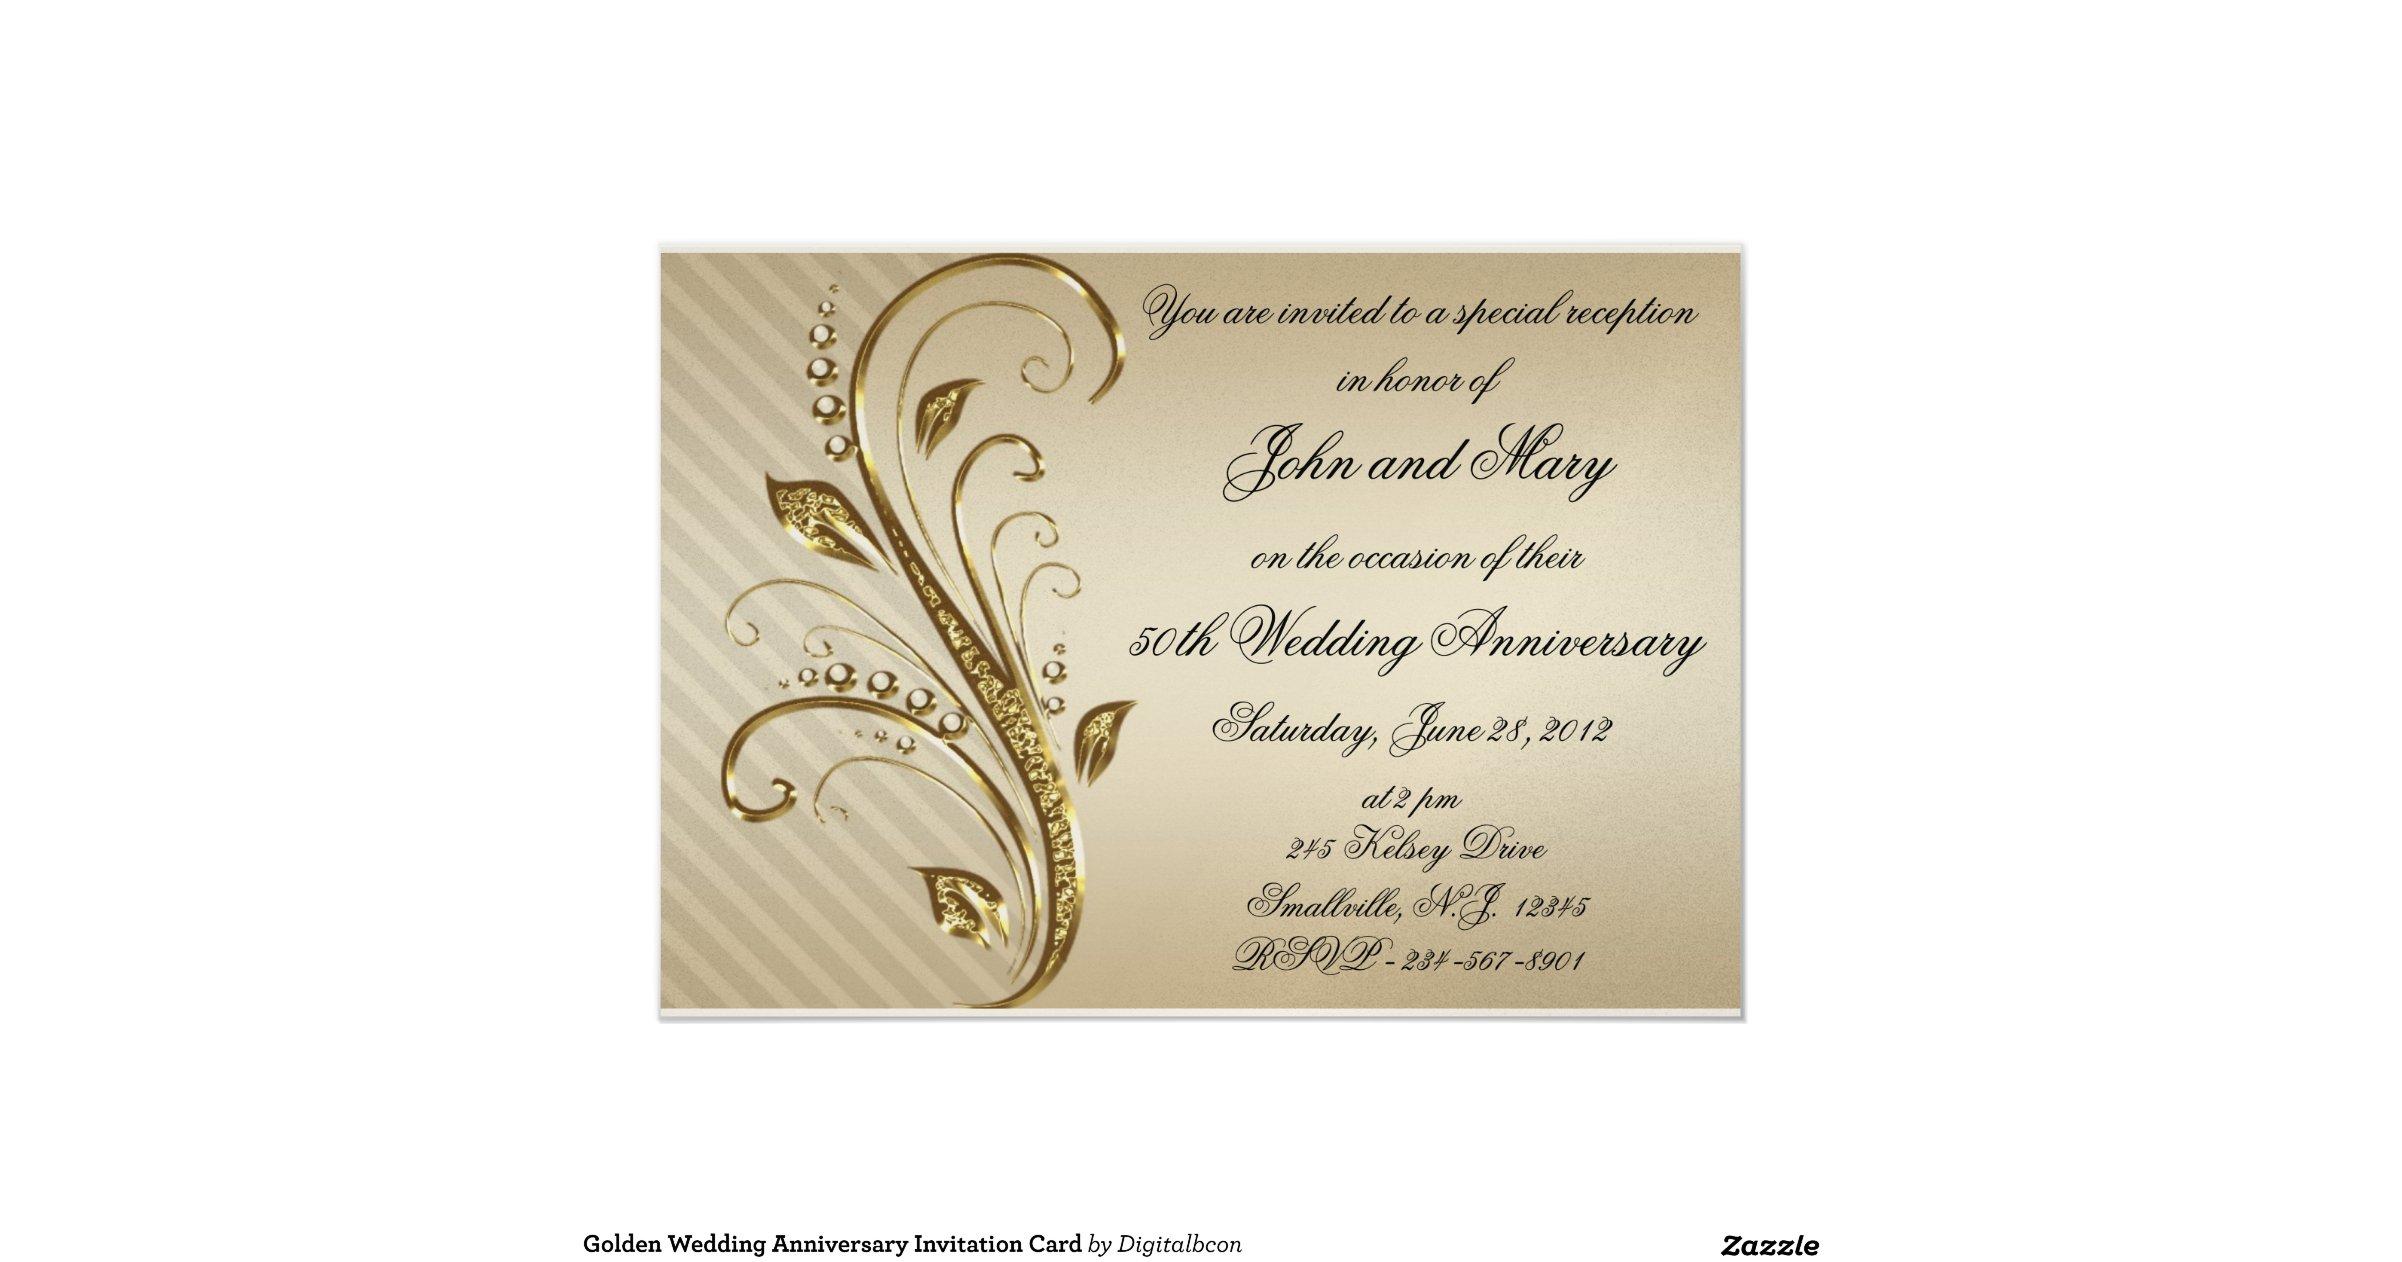 invitation cards golden wedding anniversary - 28 images - golden ...